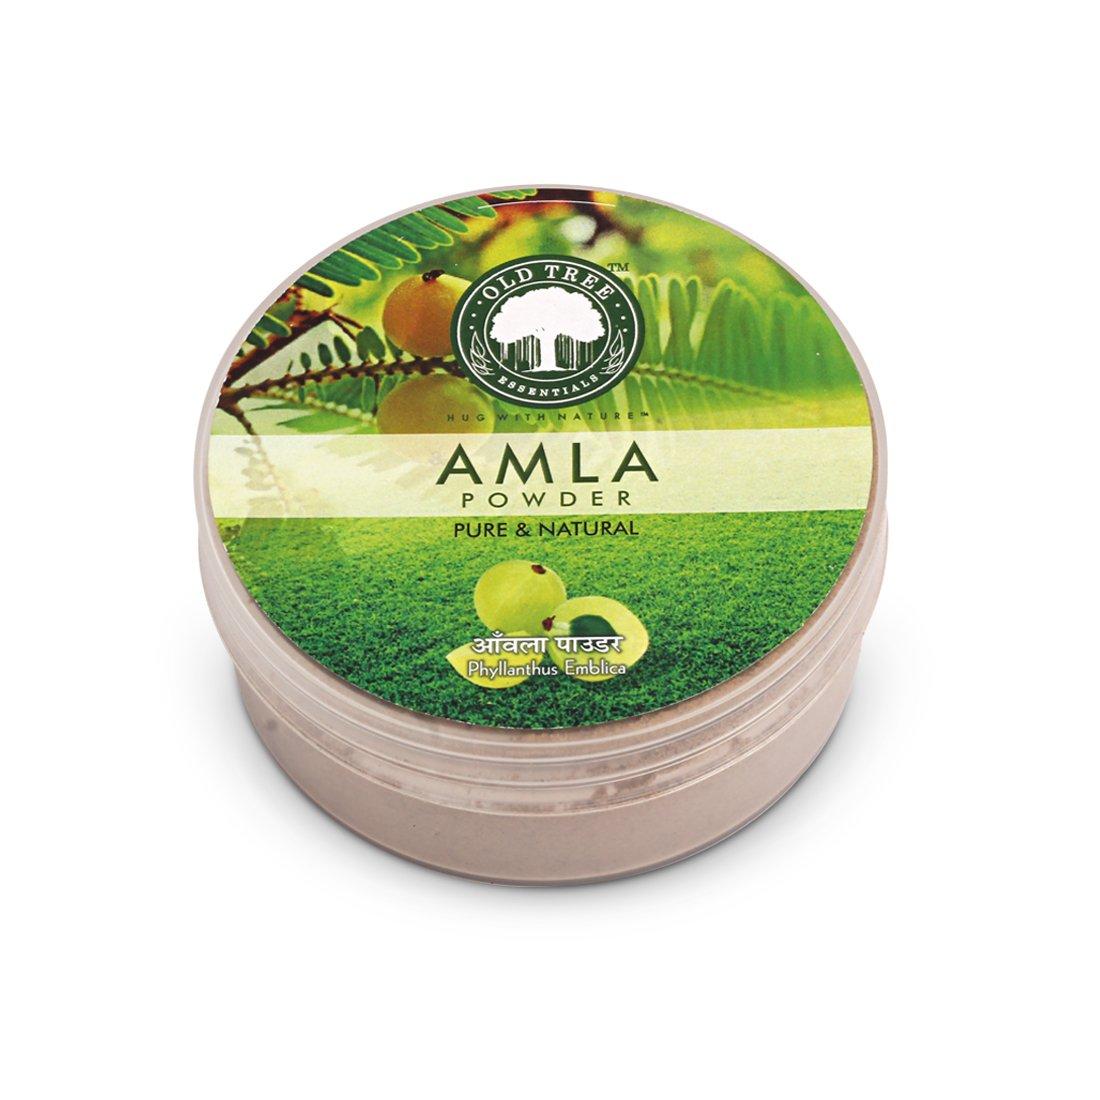 Old Tree Amla Powder for Hair Growth,100g